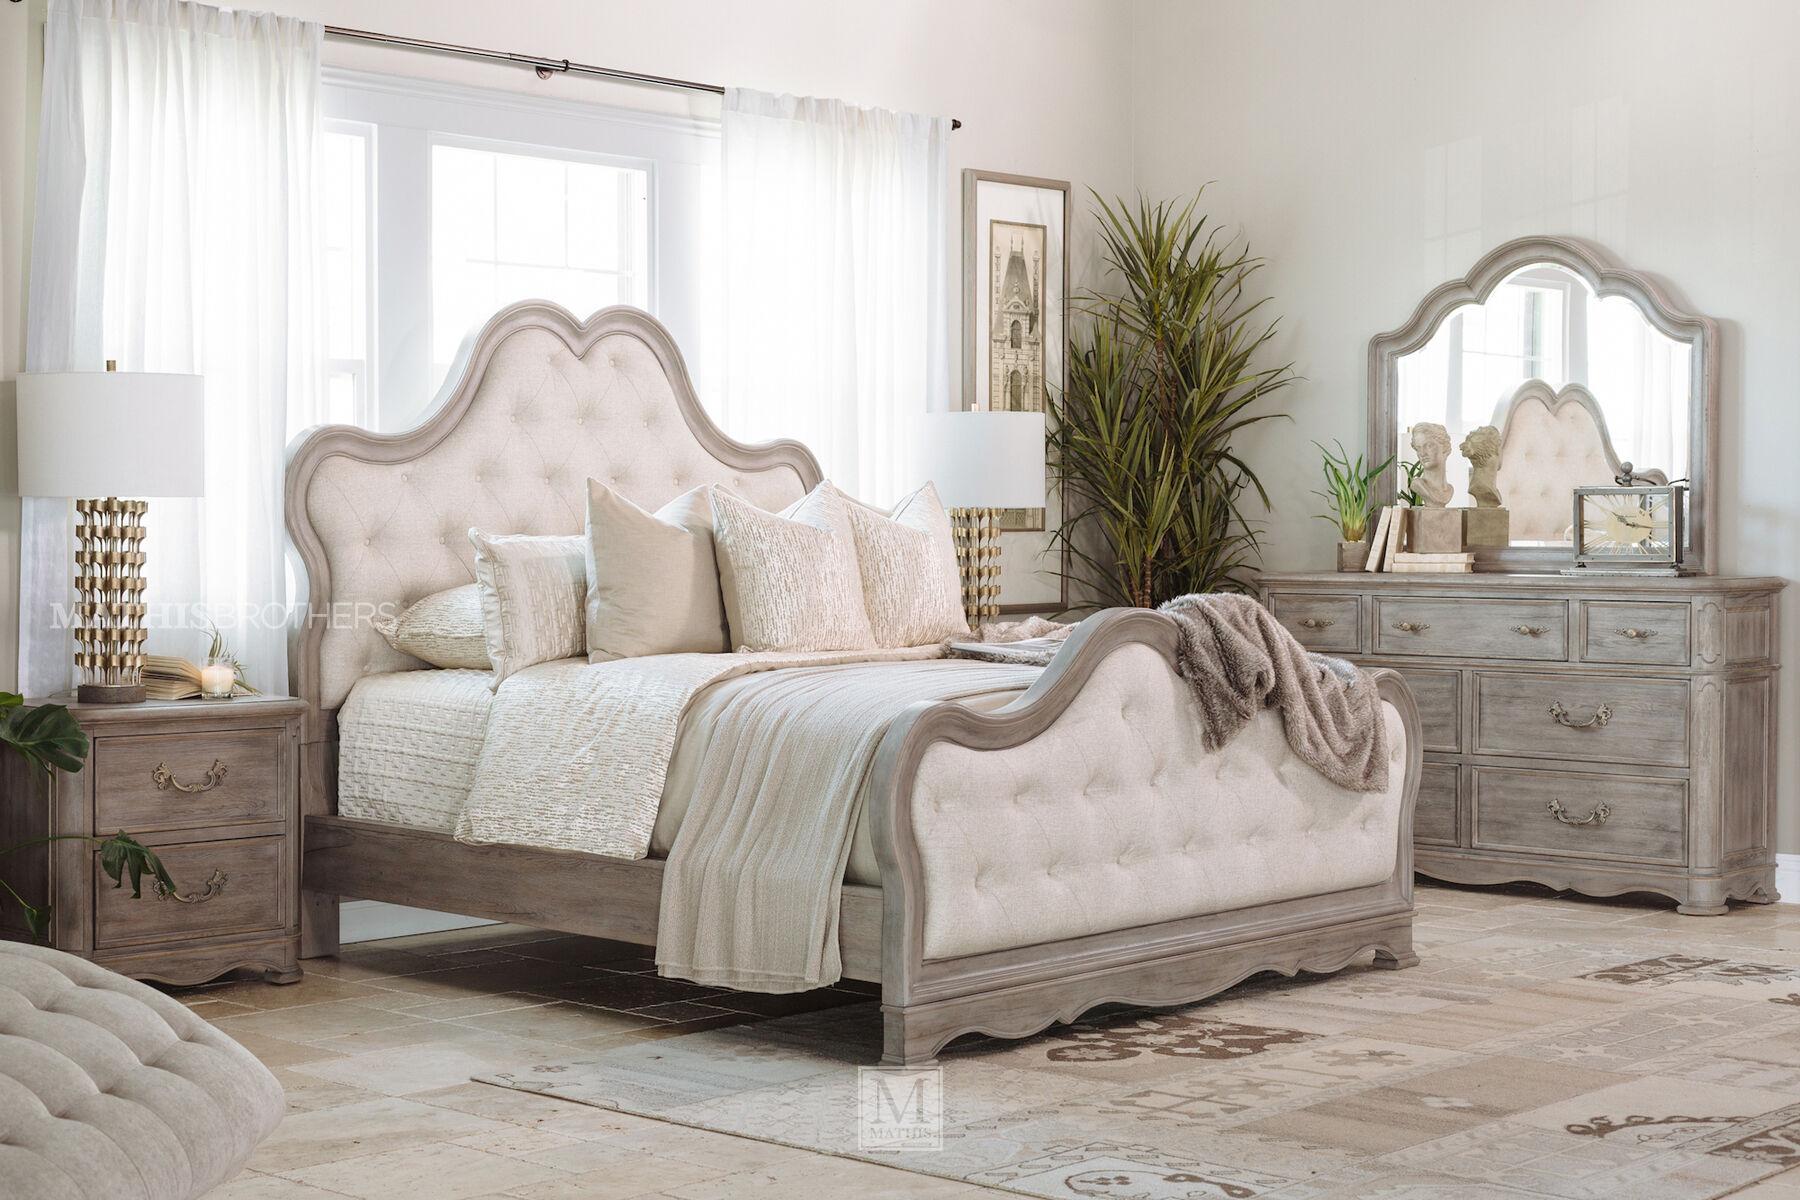 Pulaski Simply Charming Queen Bedroom Suite Pulaski Simply Charming Queen  Bedroom Suite